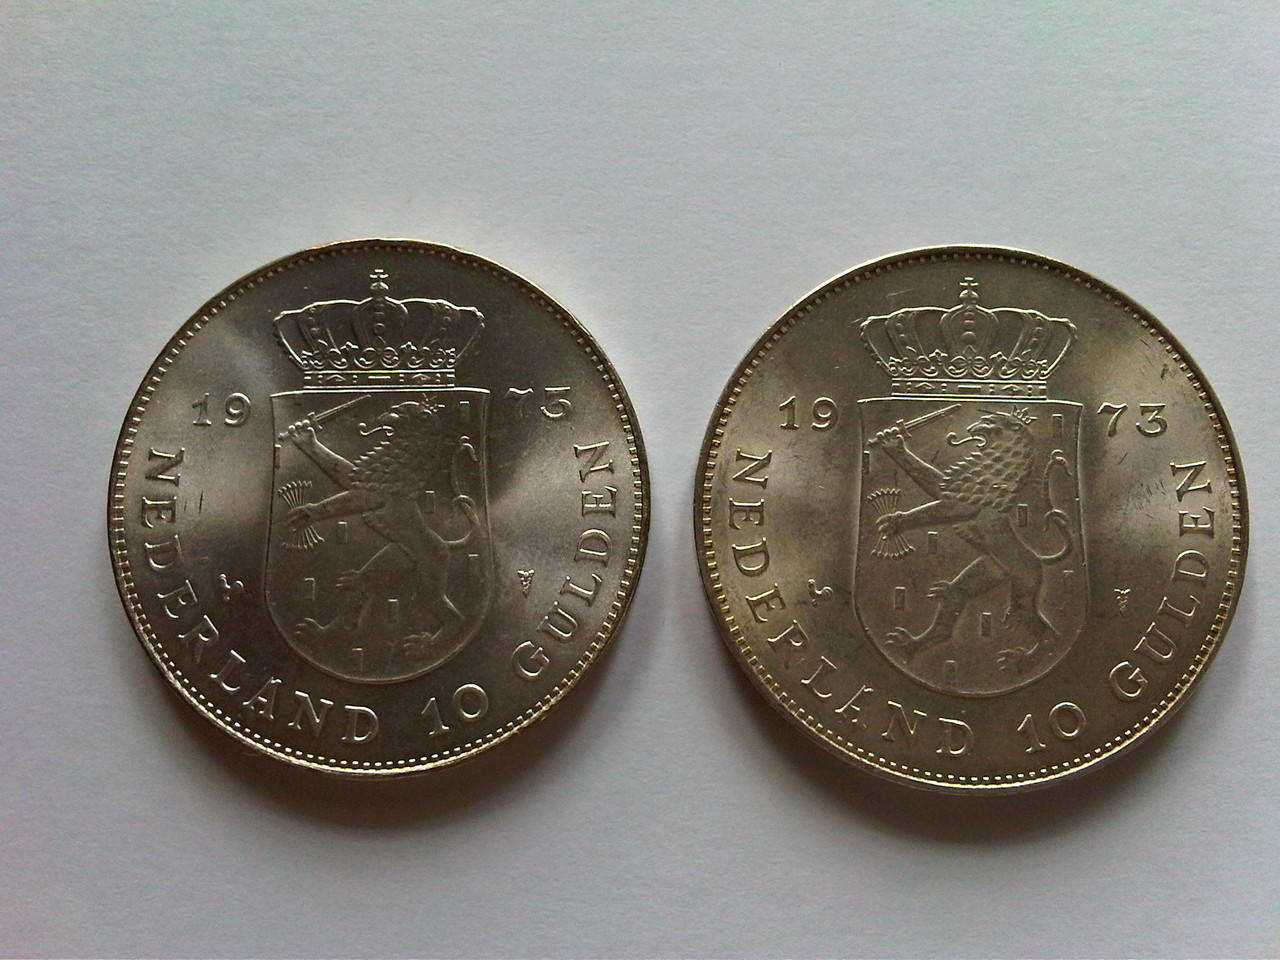 Koin Perak Netherlands 1973